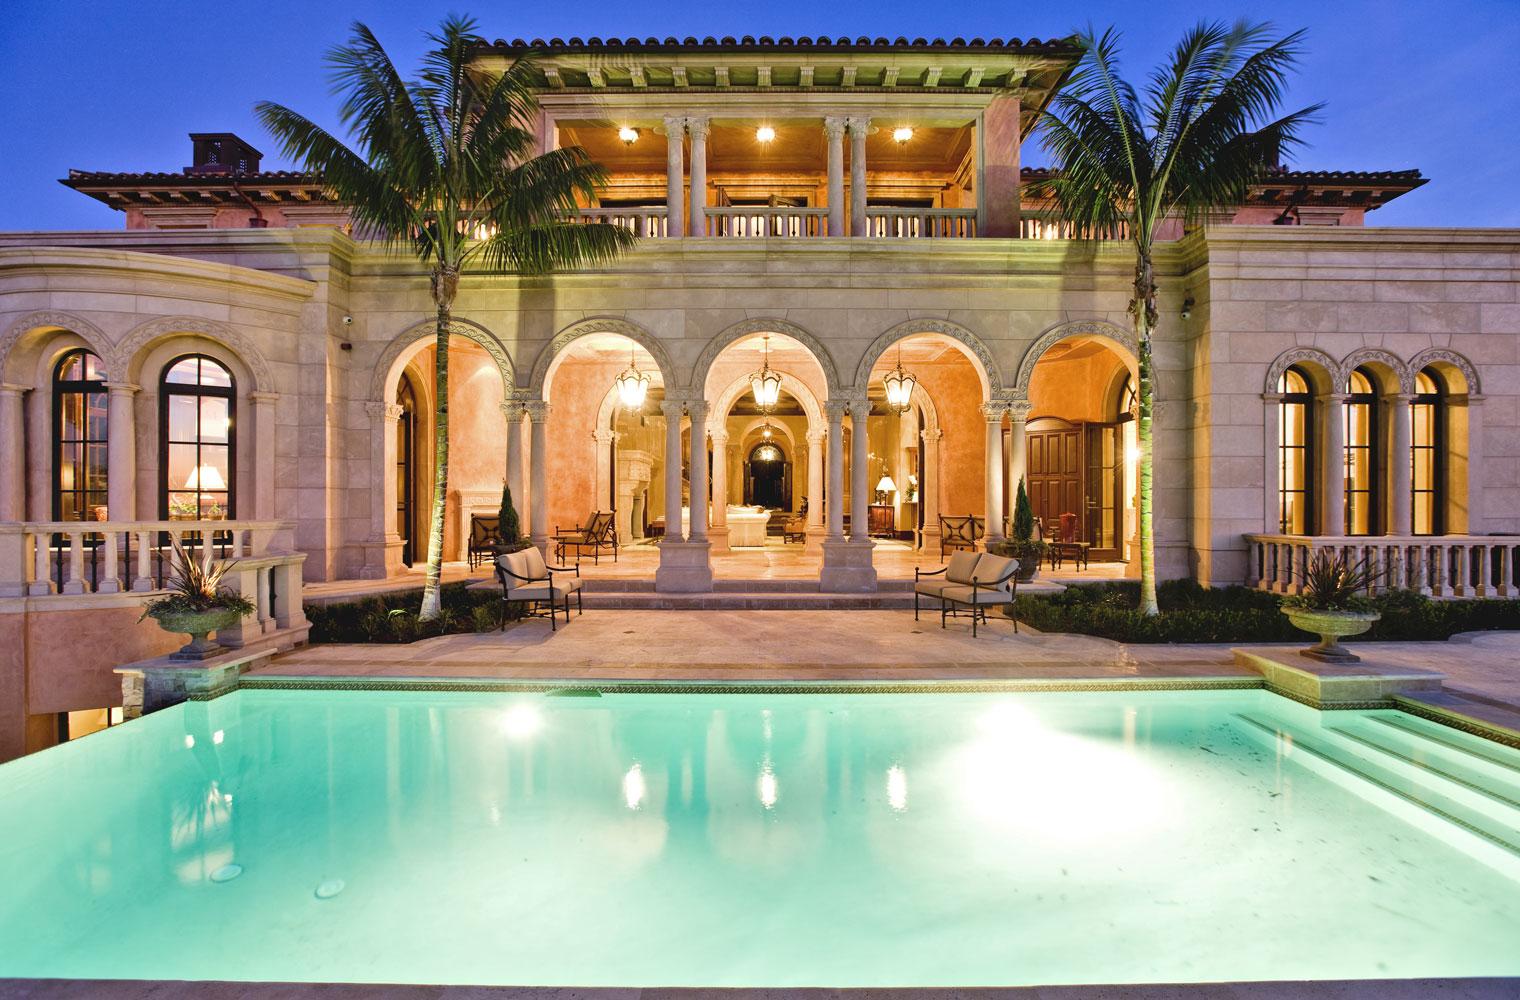 Italianate-Rear-Exterior-Pool-Indoor-Outdoor-Archways-Corbin-Reeves.jpg